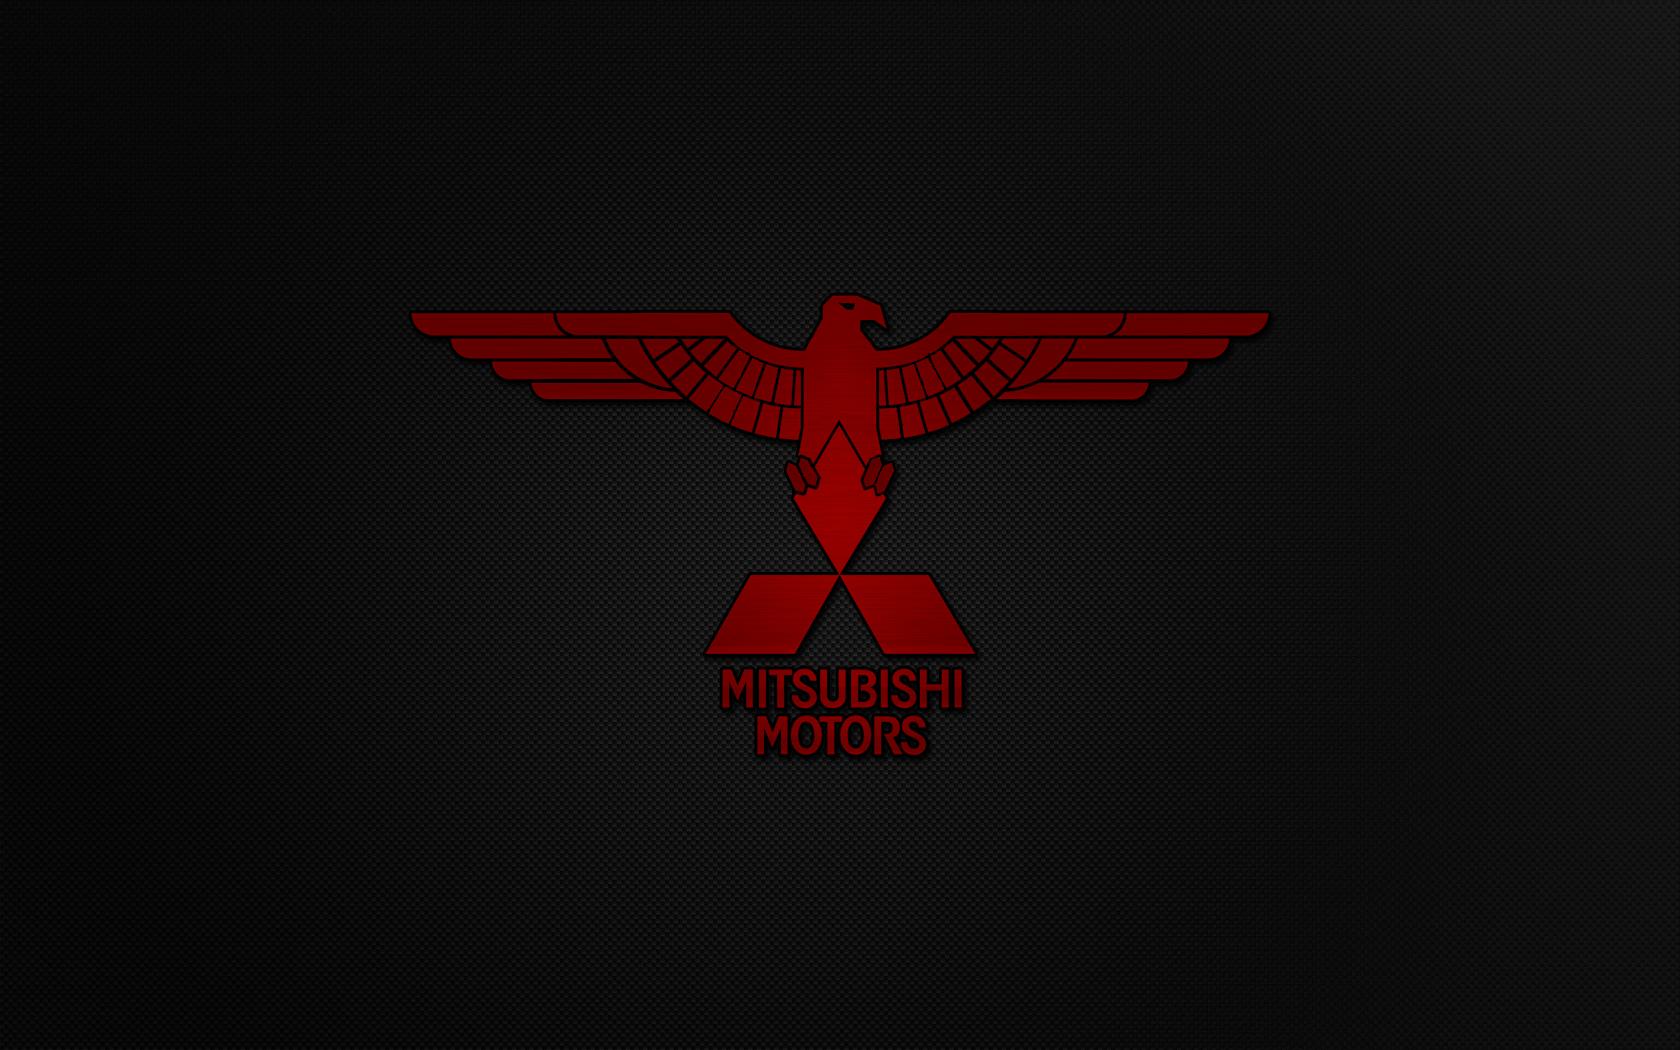 Mitsubishi Motors 3 by beside2k 1680x1050